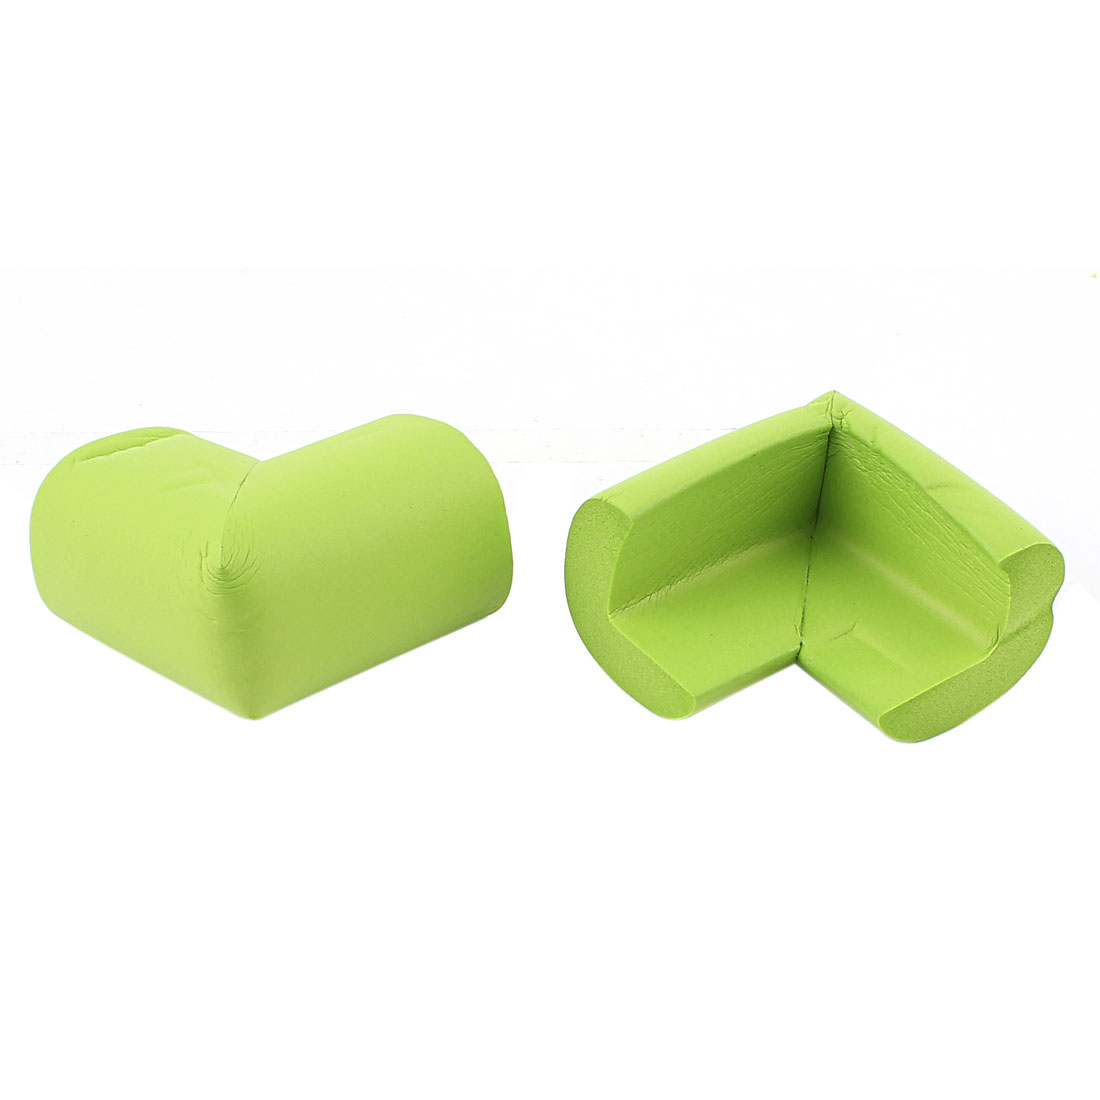 2Pcs Table Desk Shelves Edge Corner Cushion Safety Bumper Guard Protector Green